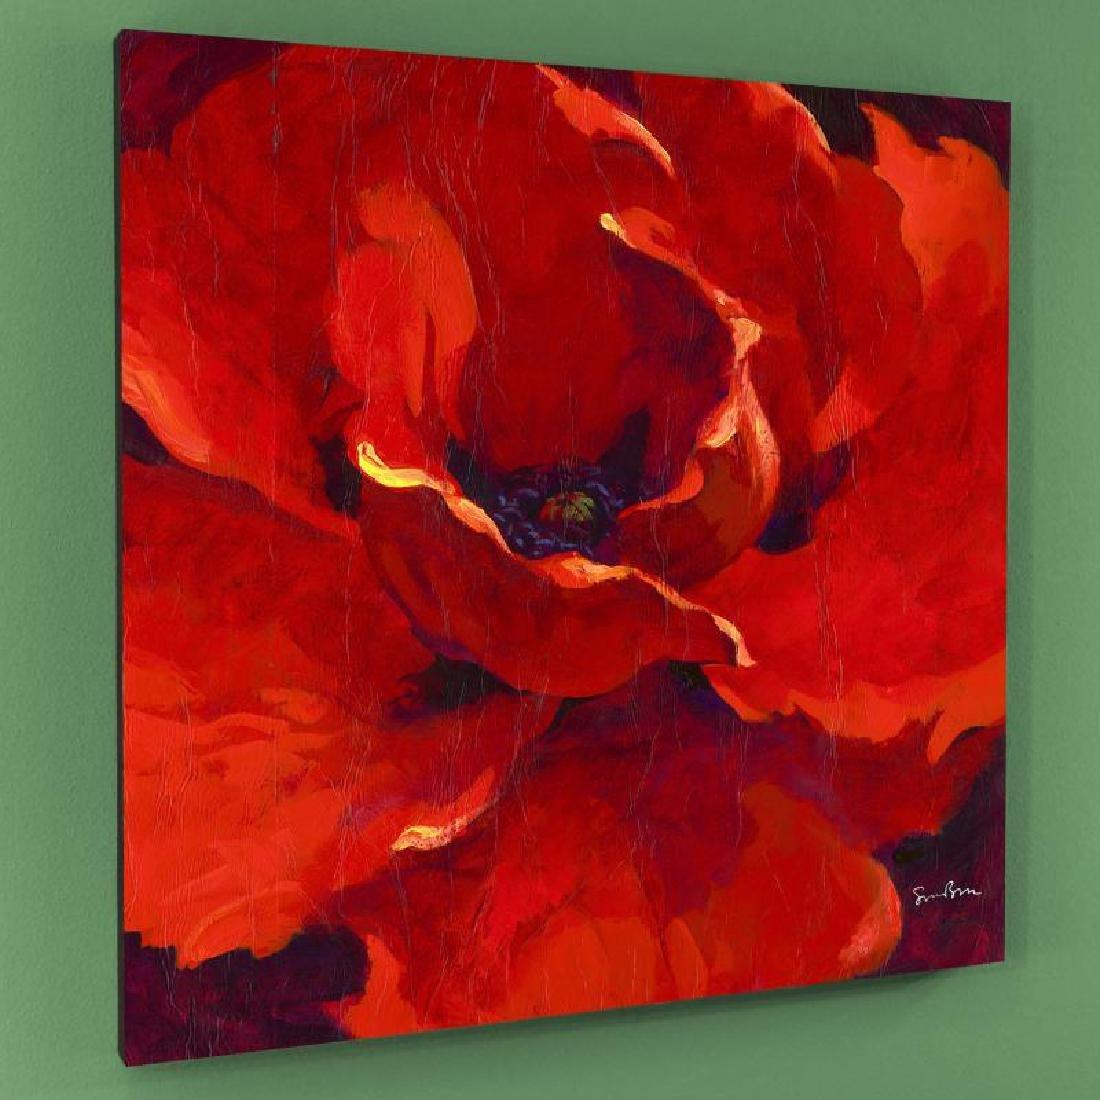 """Gem"" Limited Edition Giclee on Canvas by Simon Bull,"